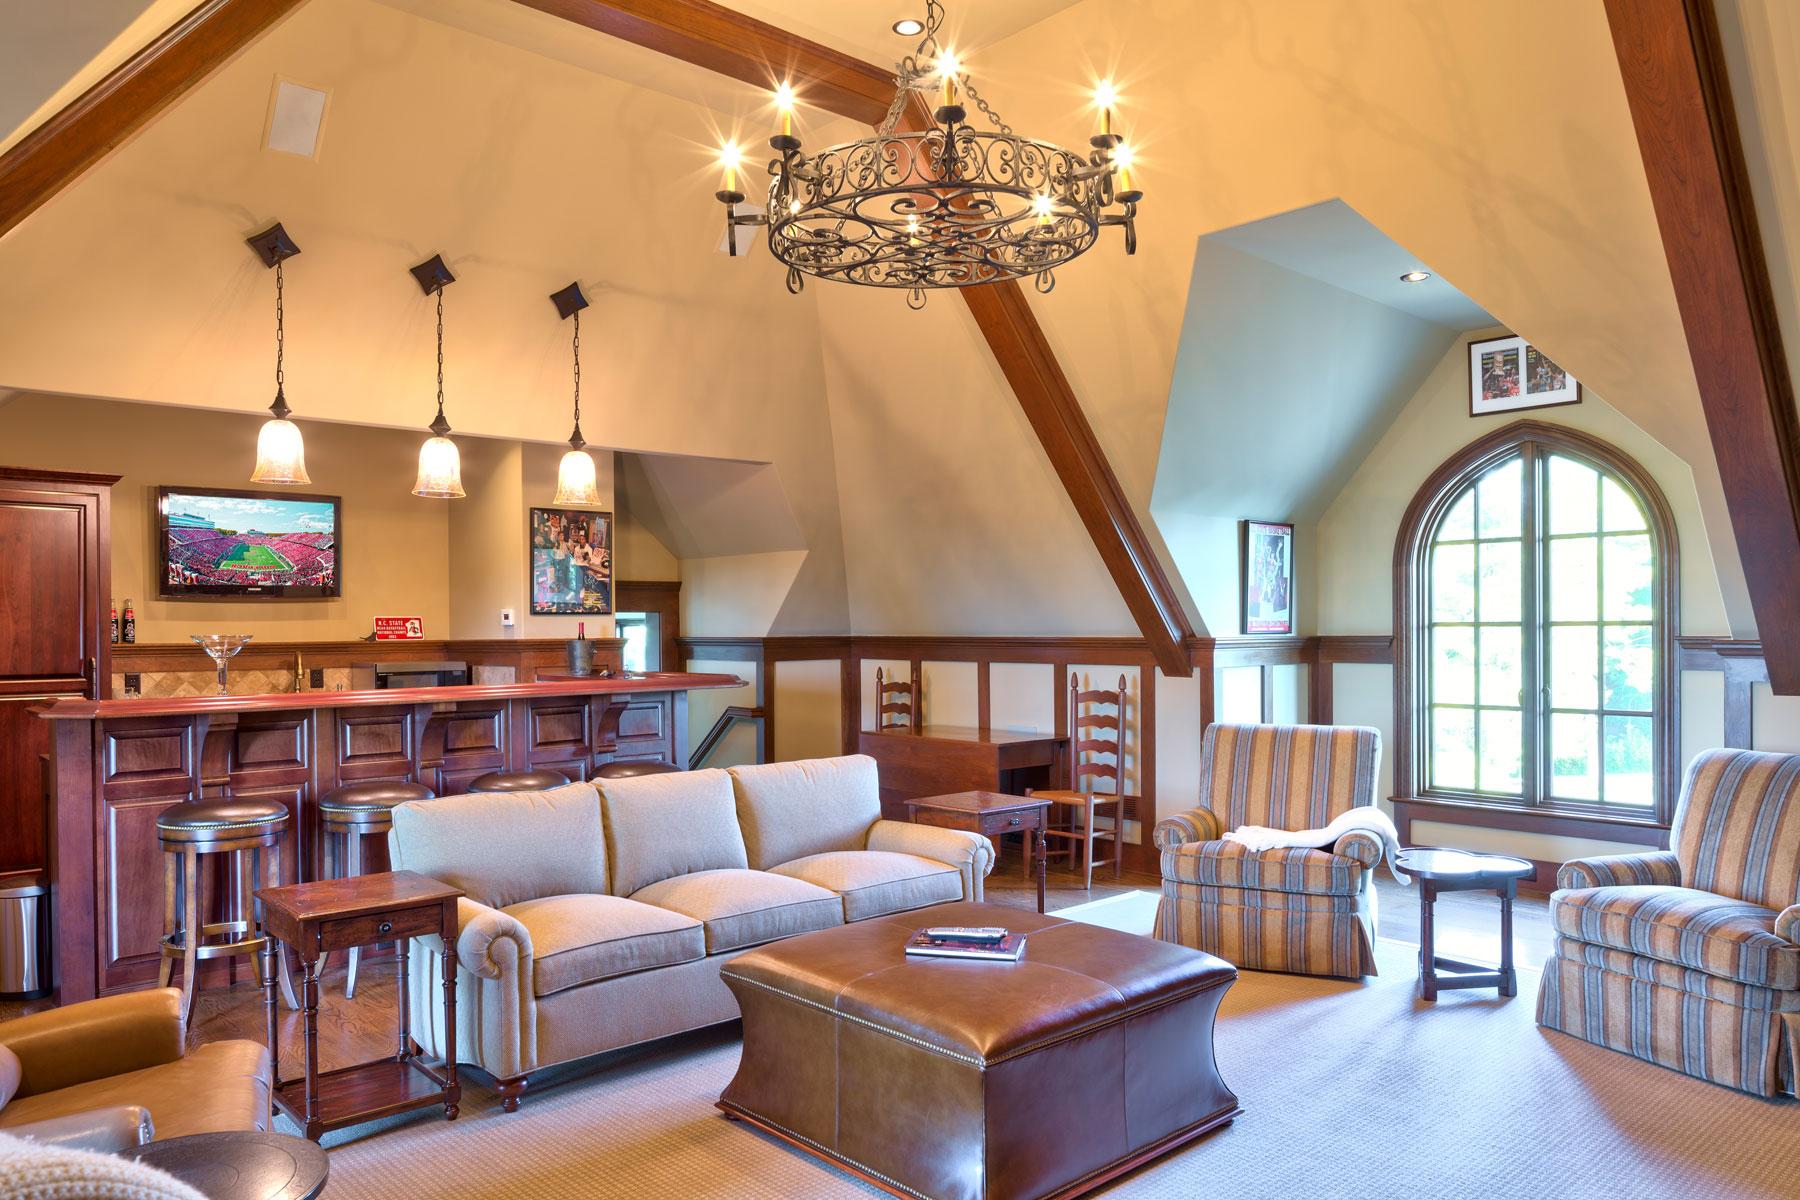 gentlemans-pub-room-luxury-home